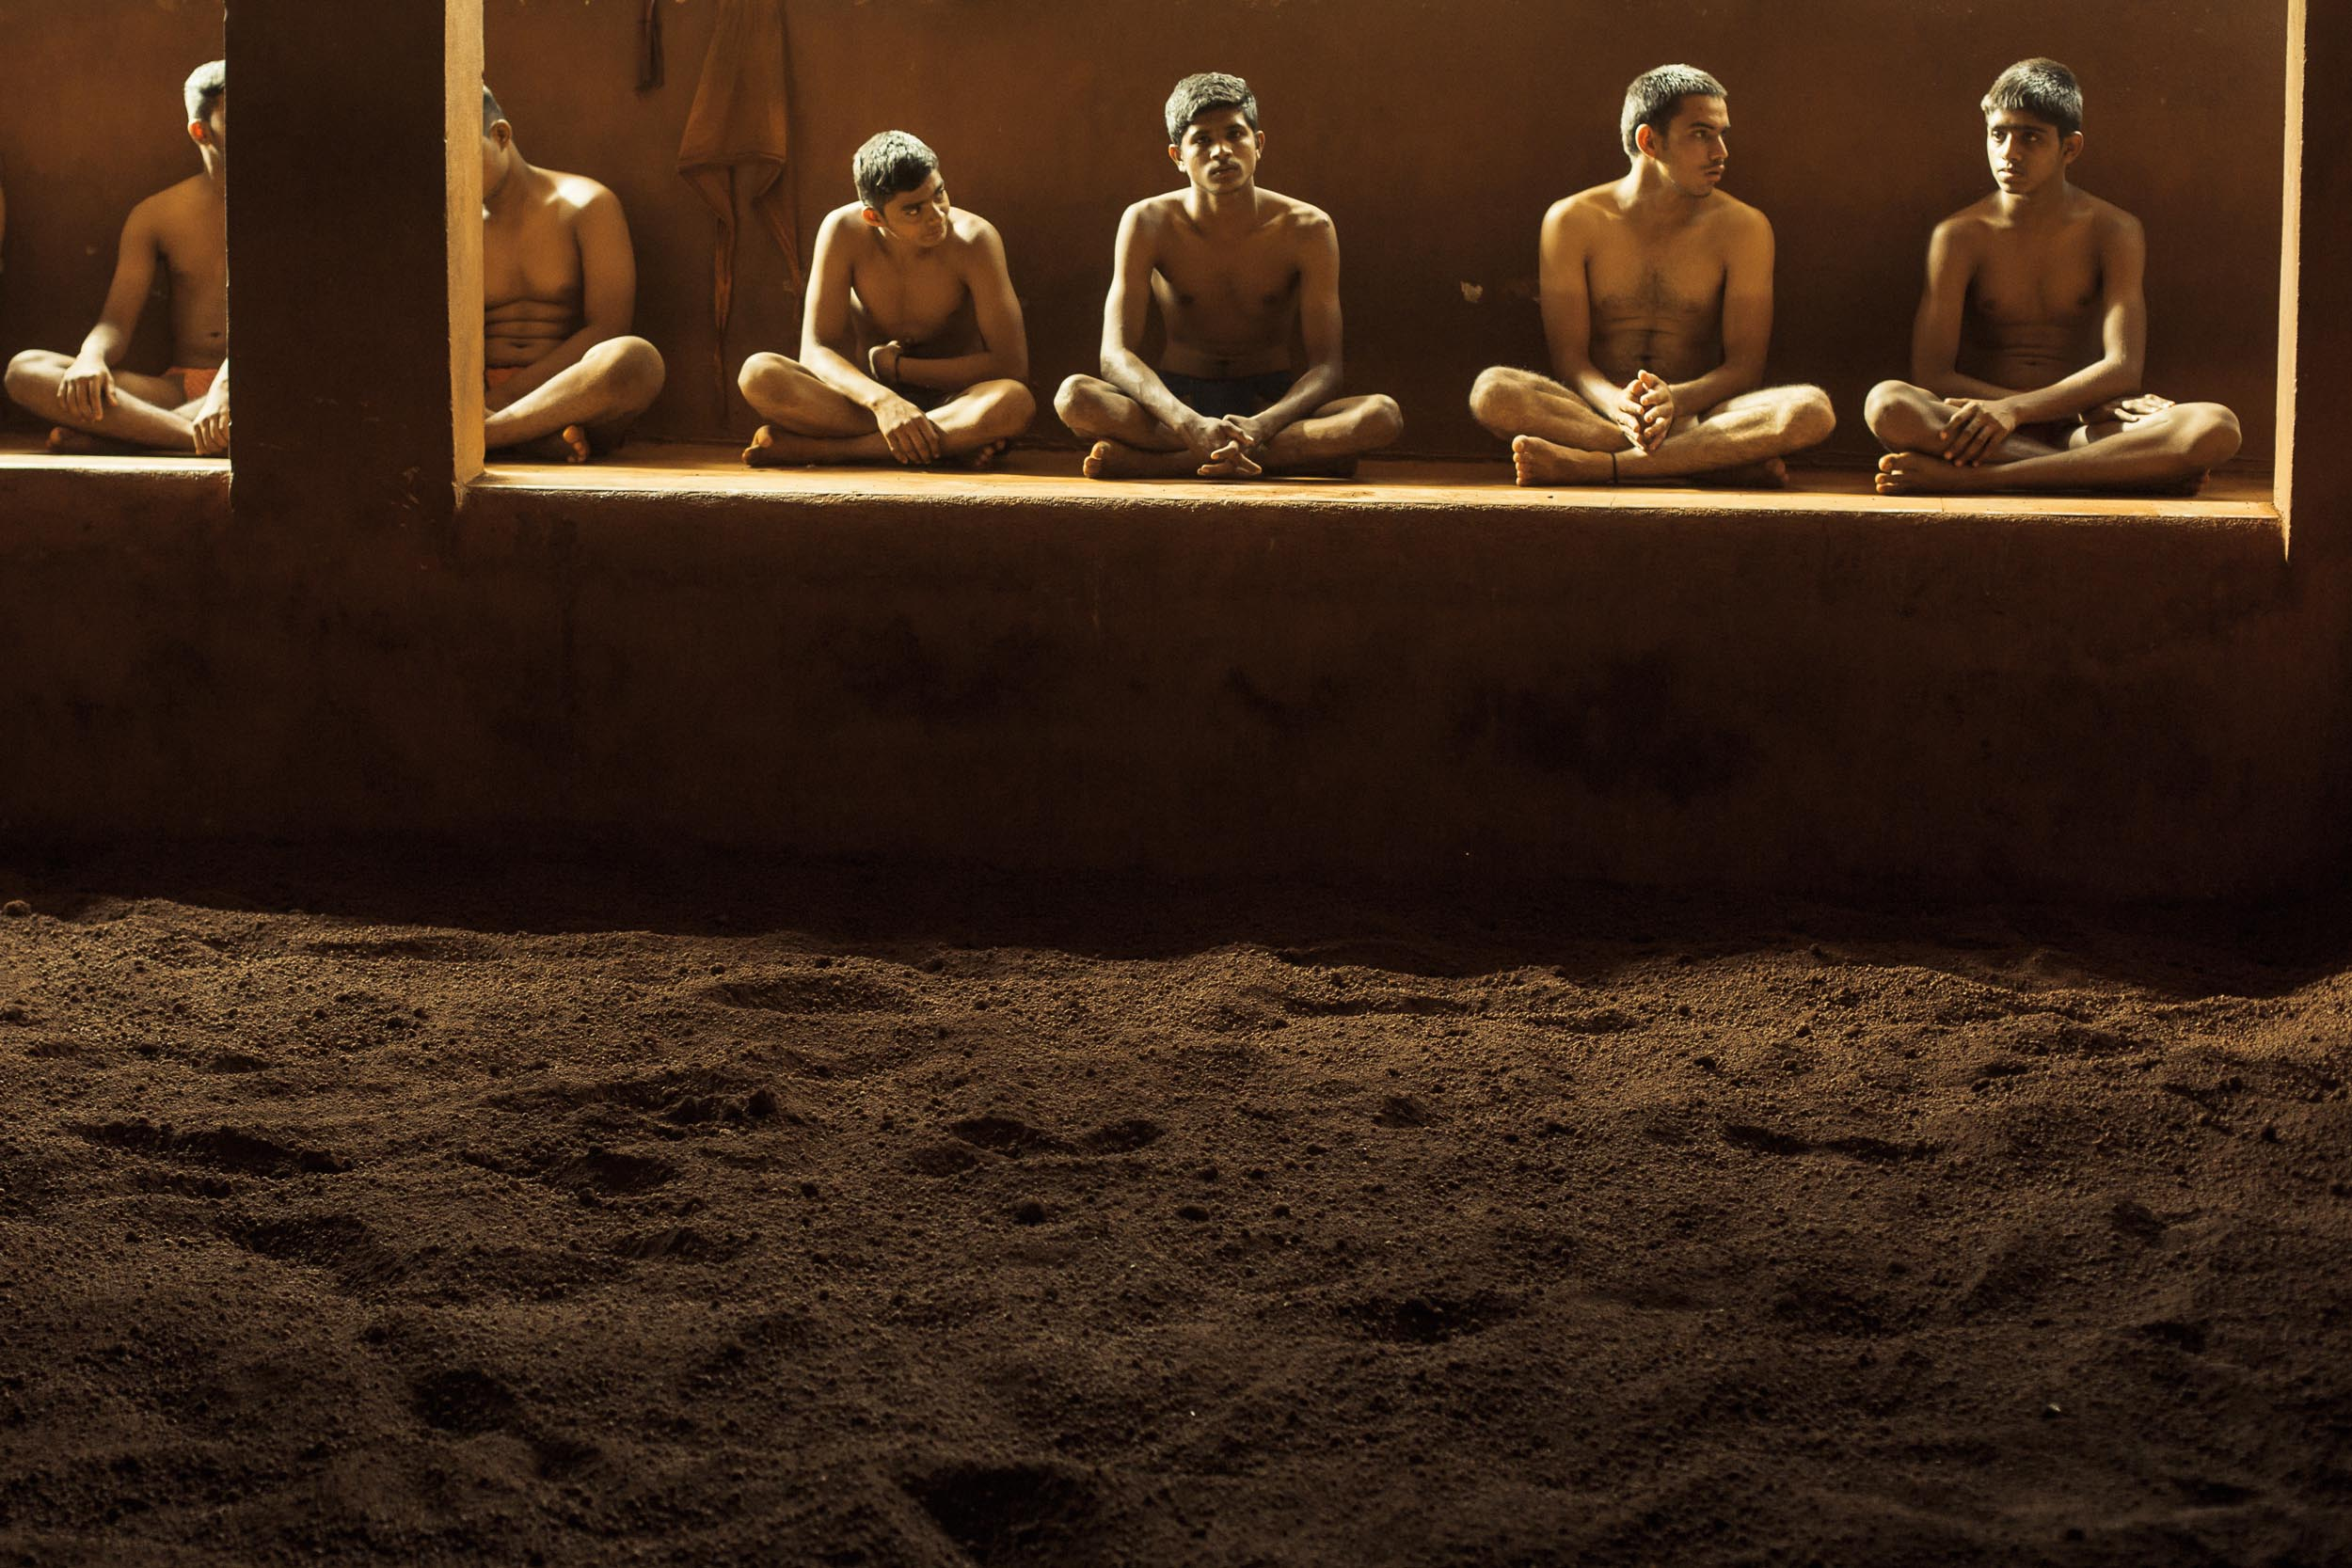 Sindhur_Photography_Travel_People_Wrestlers-16.JPG